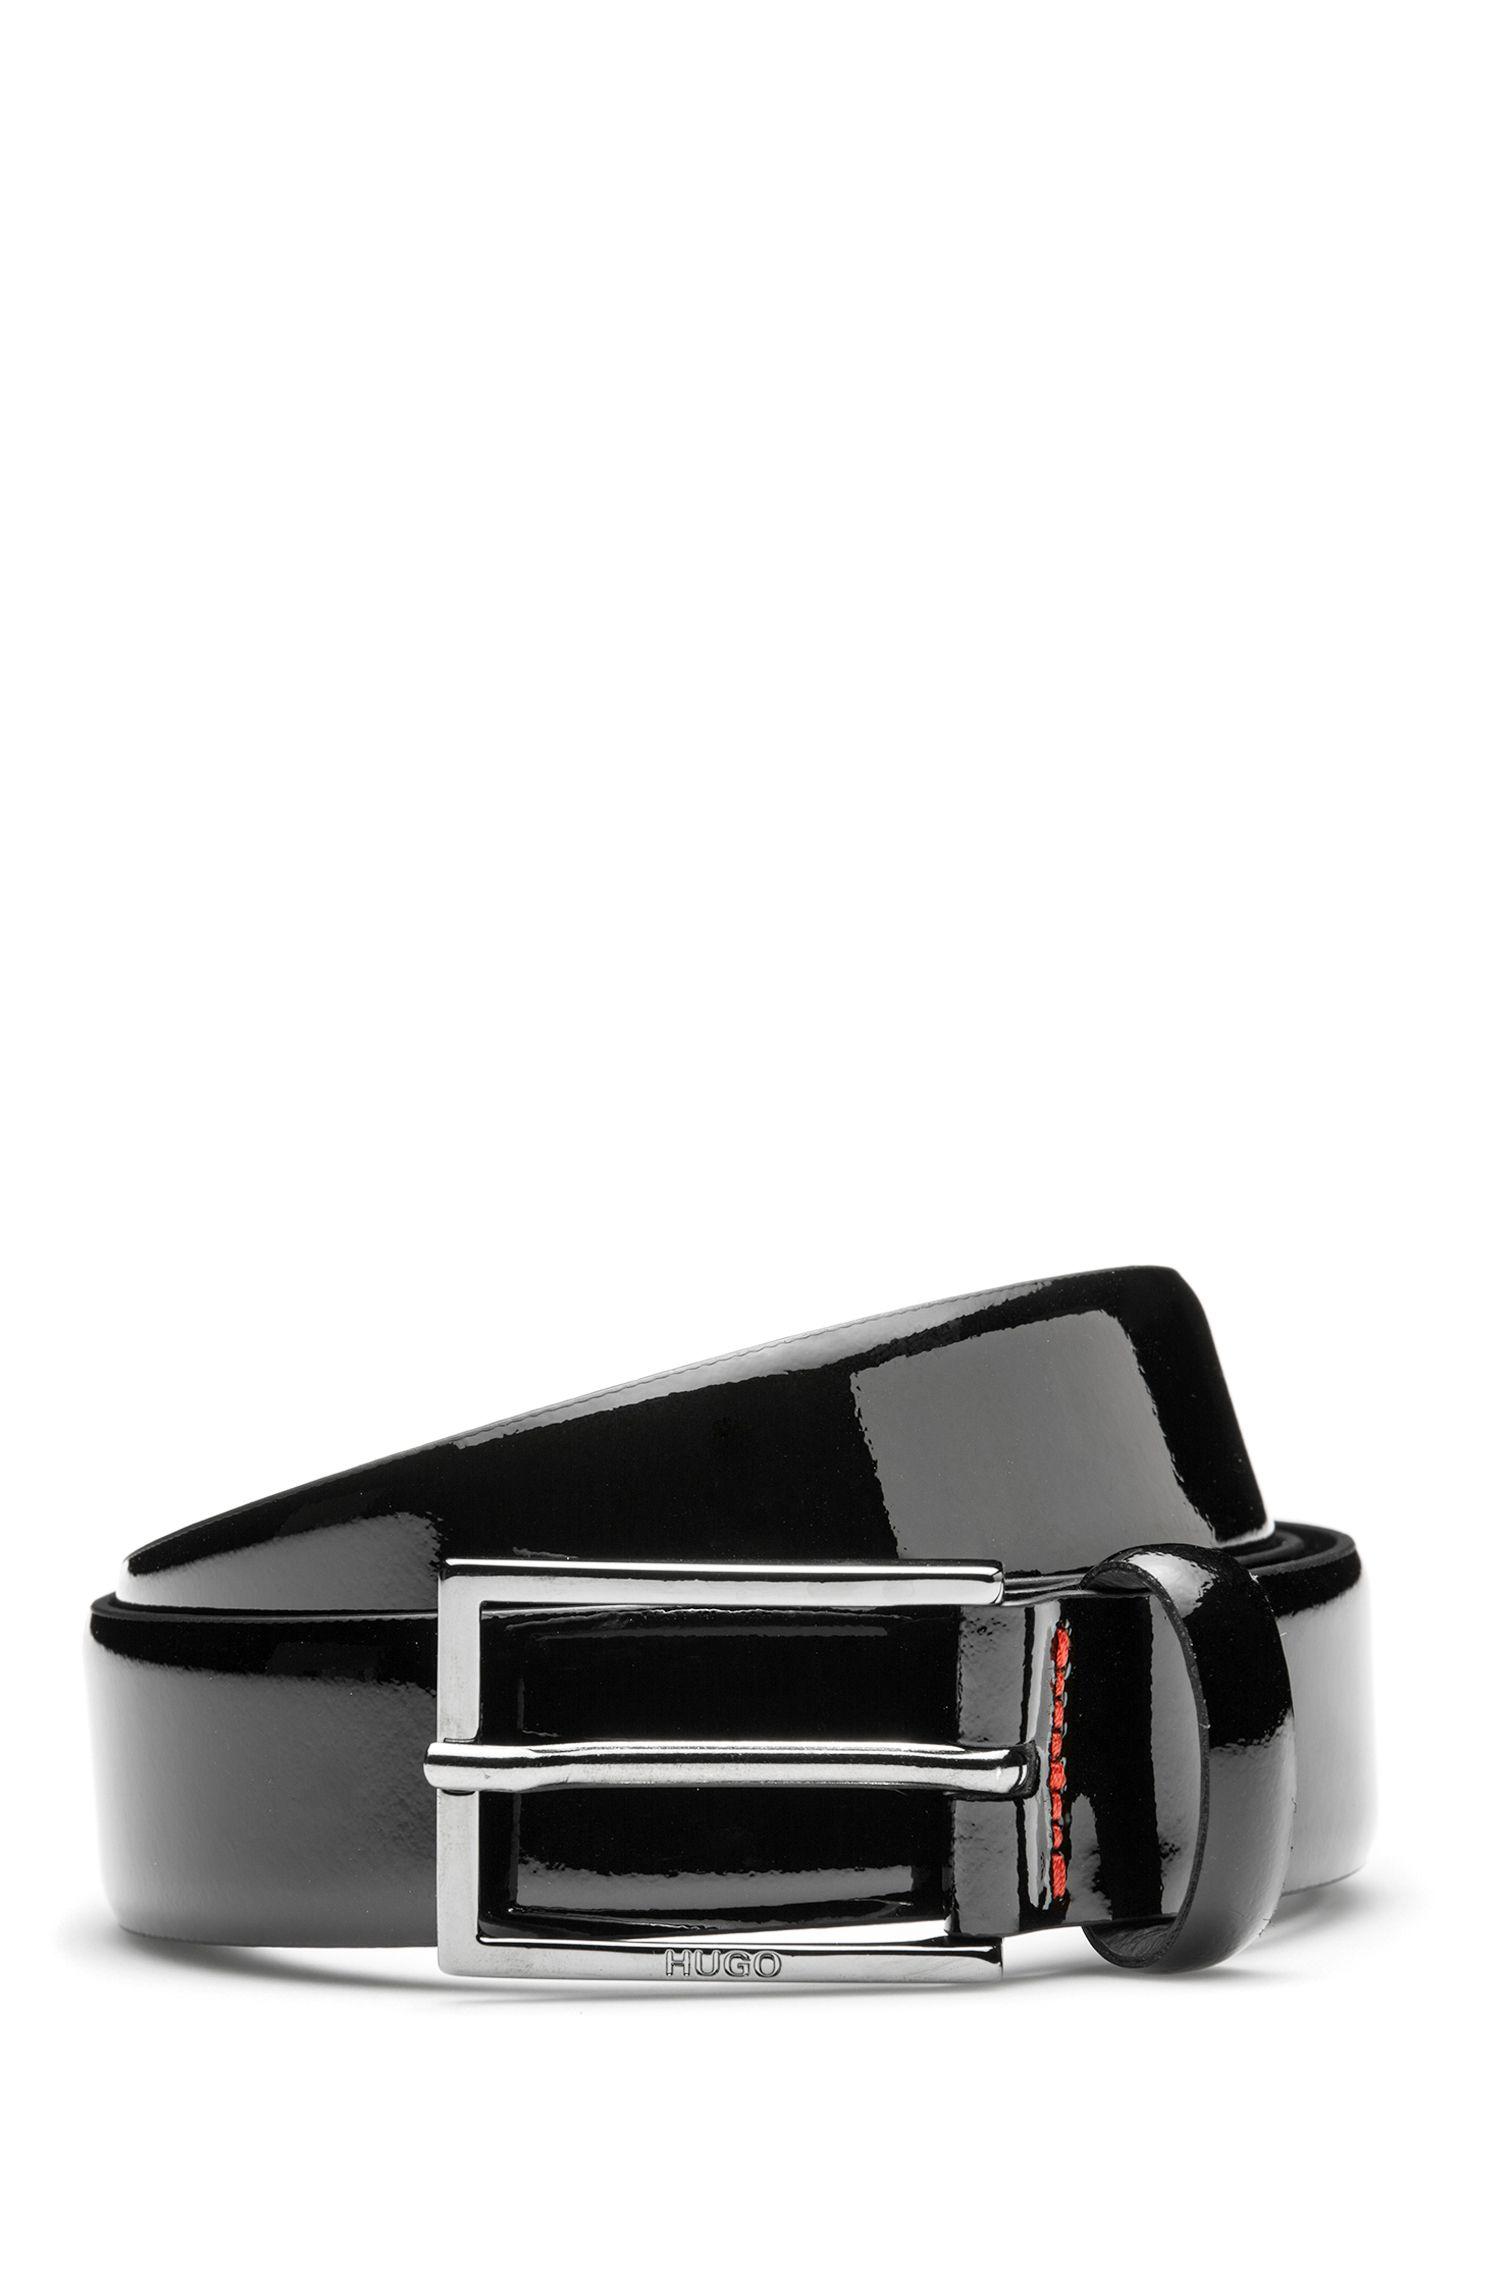 Patent Leather Belt | Gavino